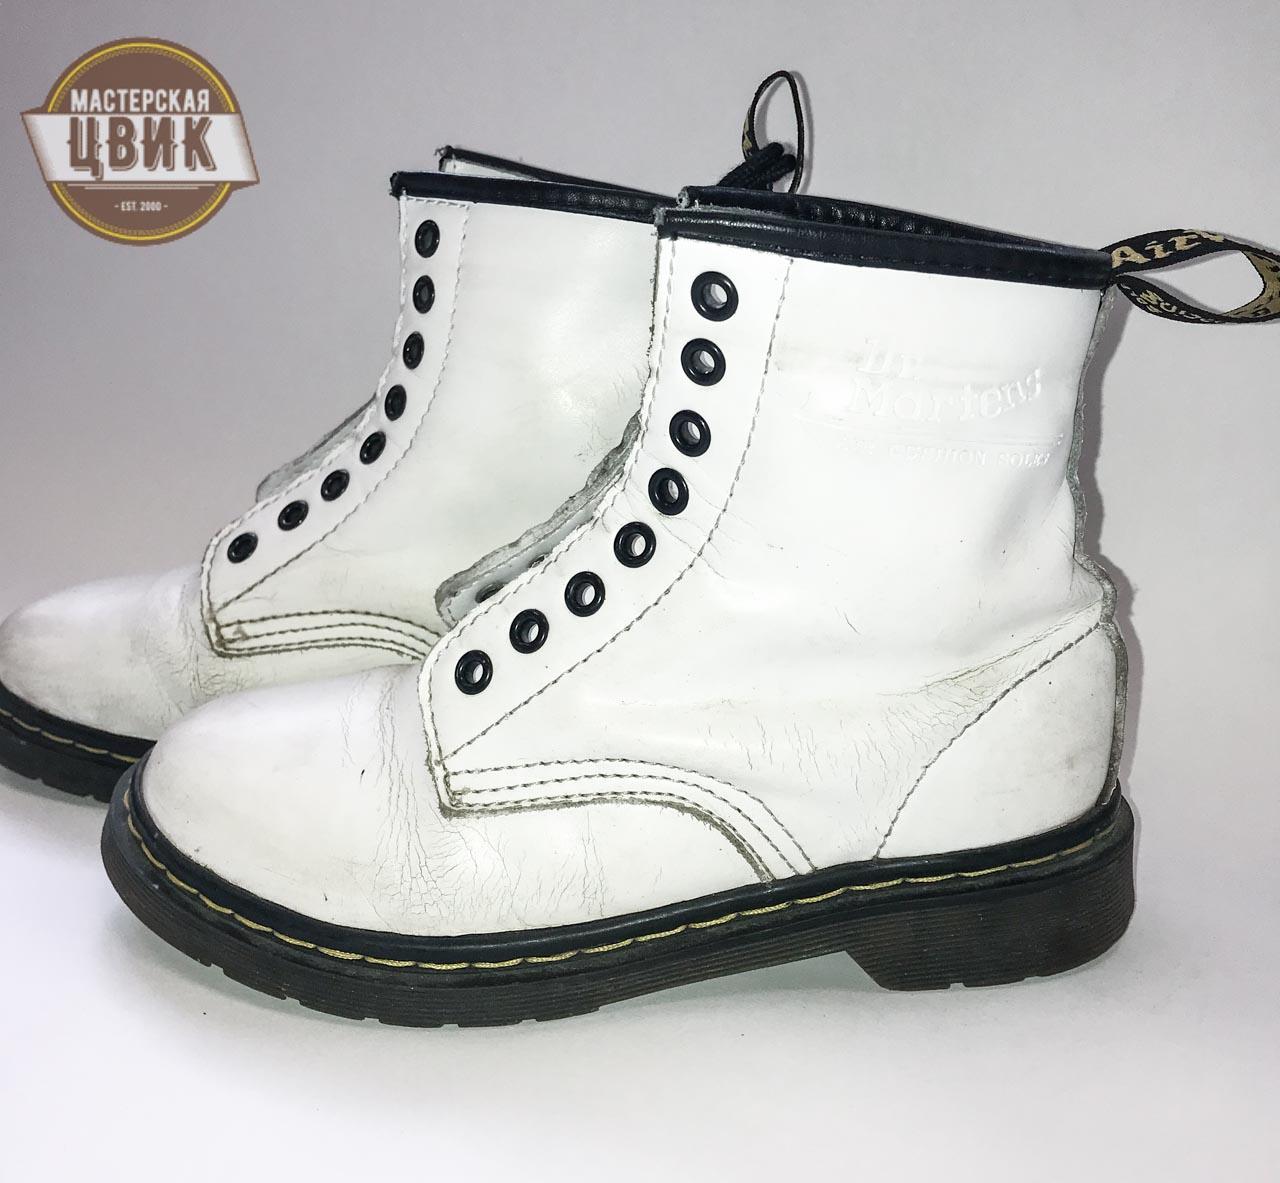 individualnyj-poshiv-obuvi-minsk-27 Индивидуальный пошив обуви Минск-27